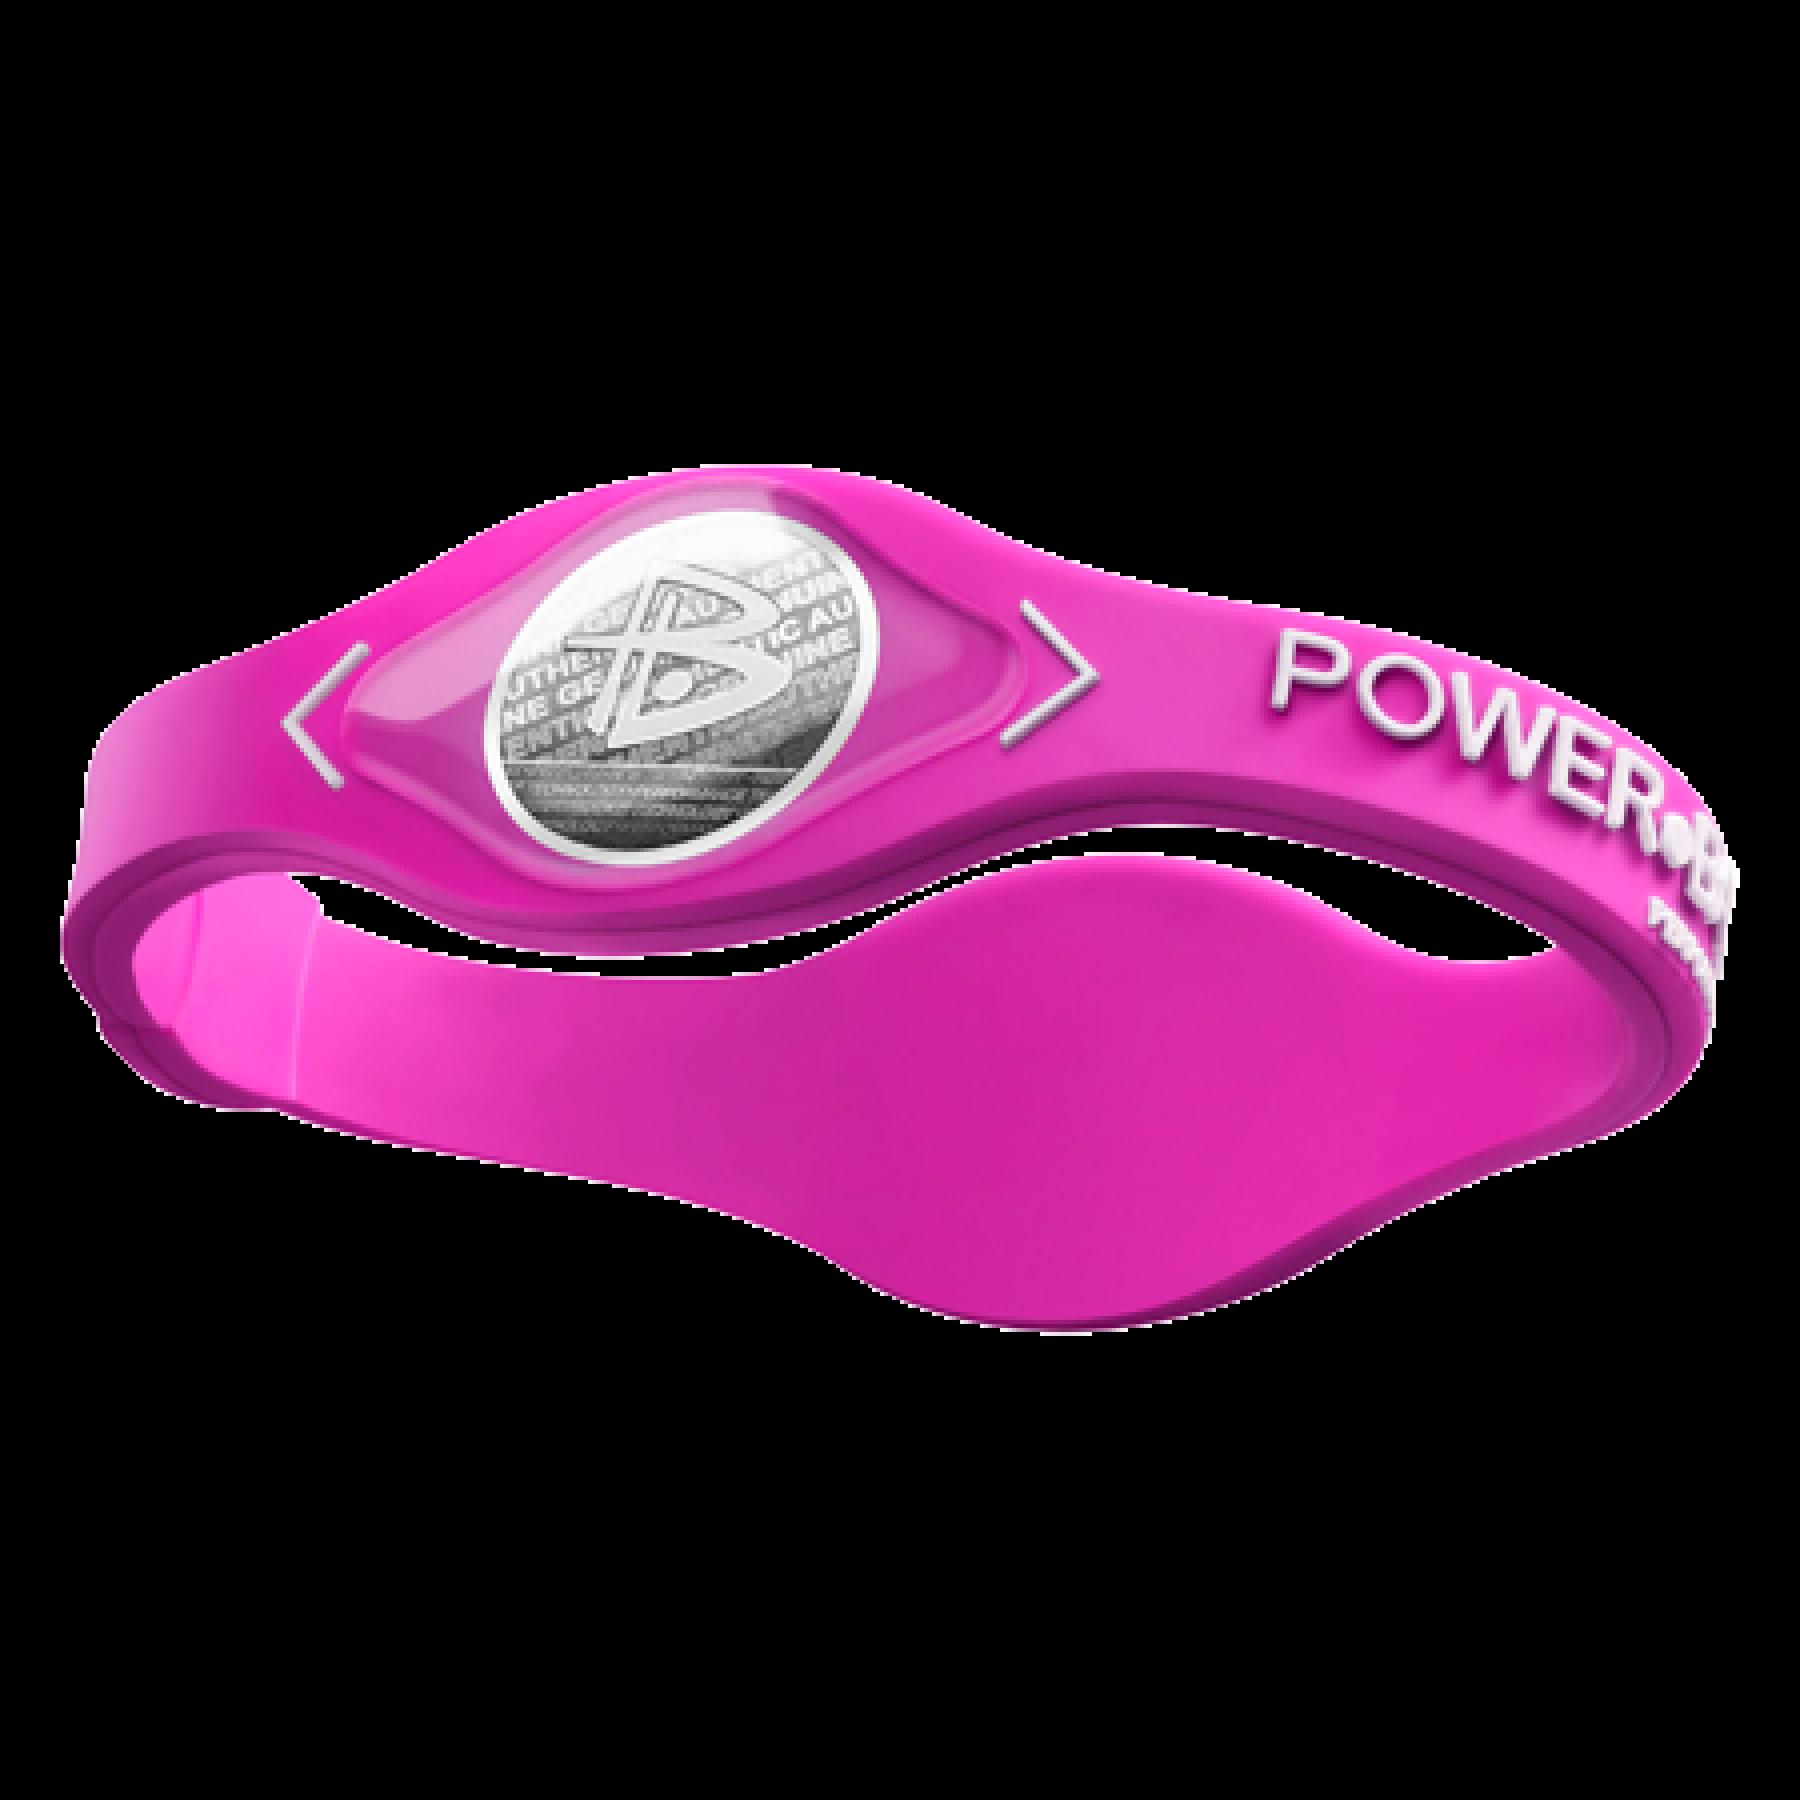 Браслет Power Balance  серия Core Pink